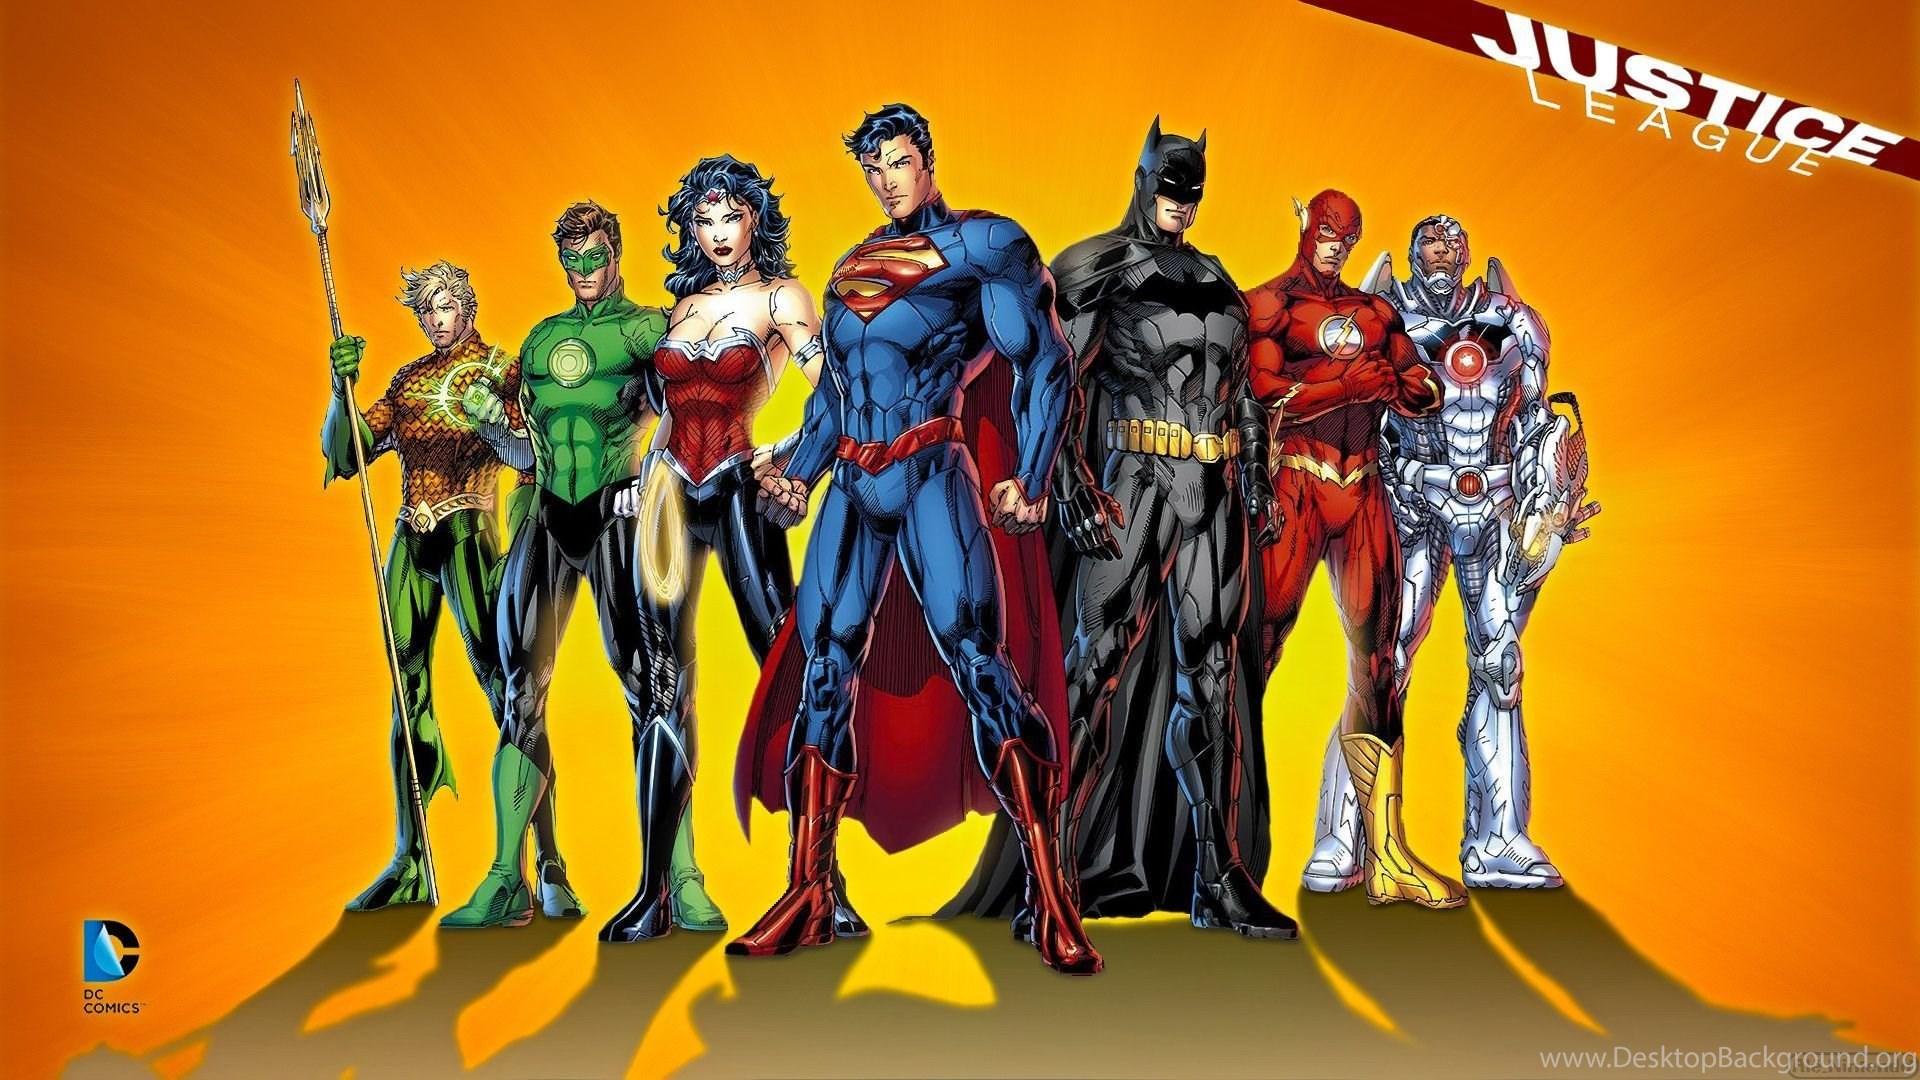 Wallpaper Daily Post Justice League Hd Wallpaper